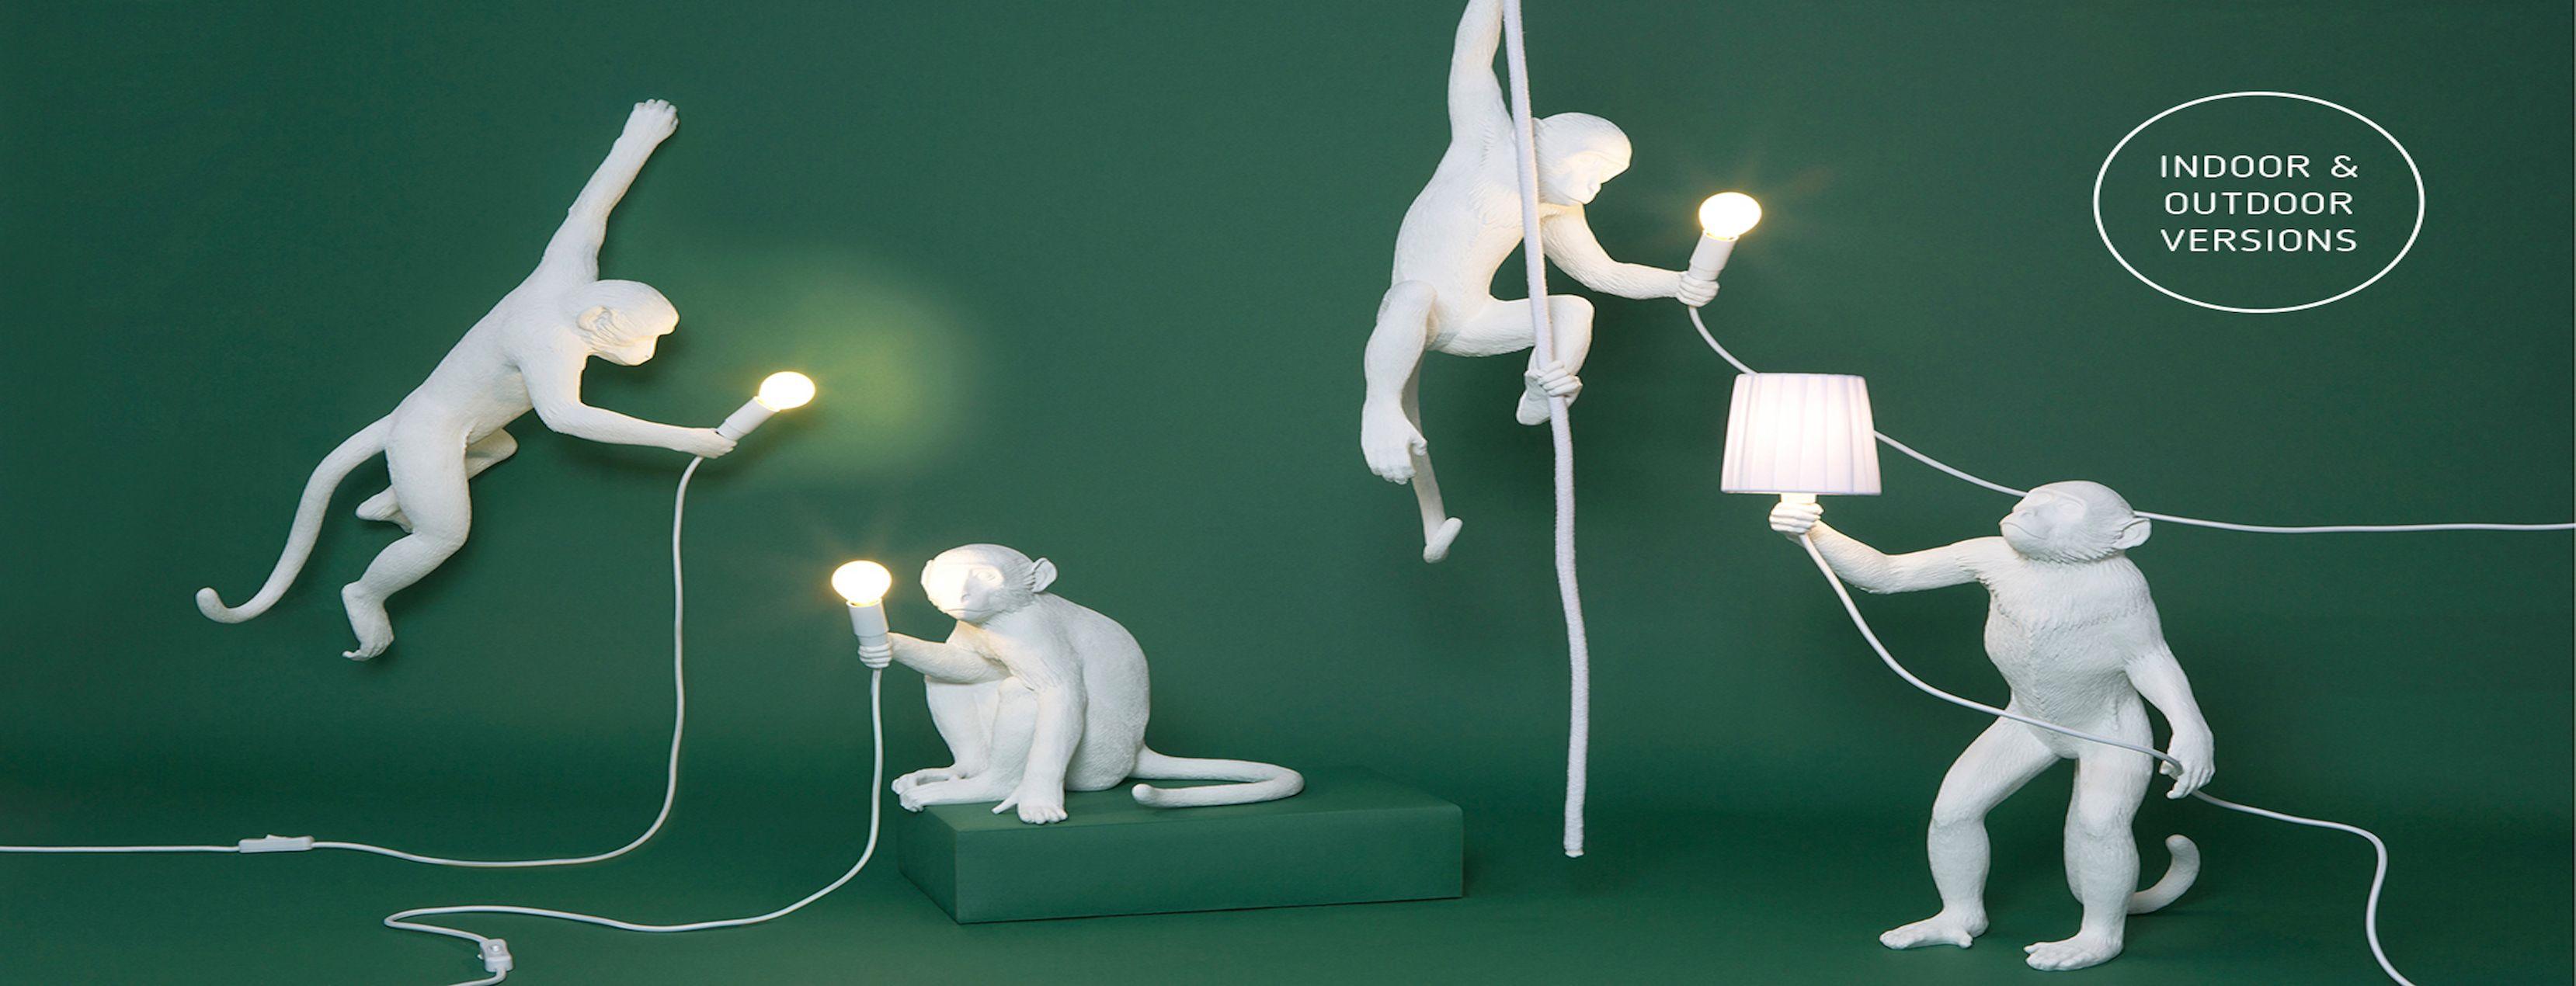 Monkey lampe SELETTI-lampe extérieur